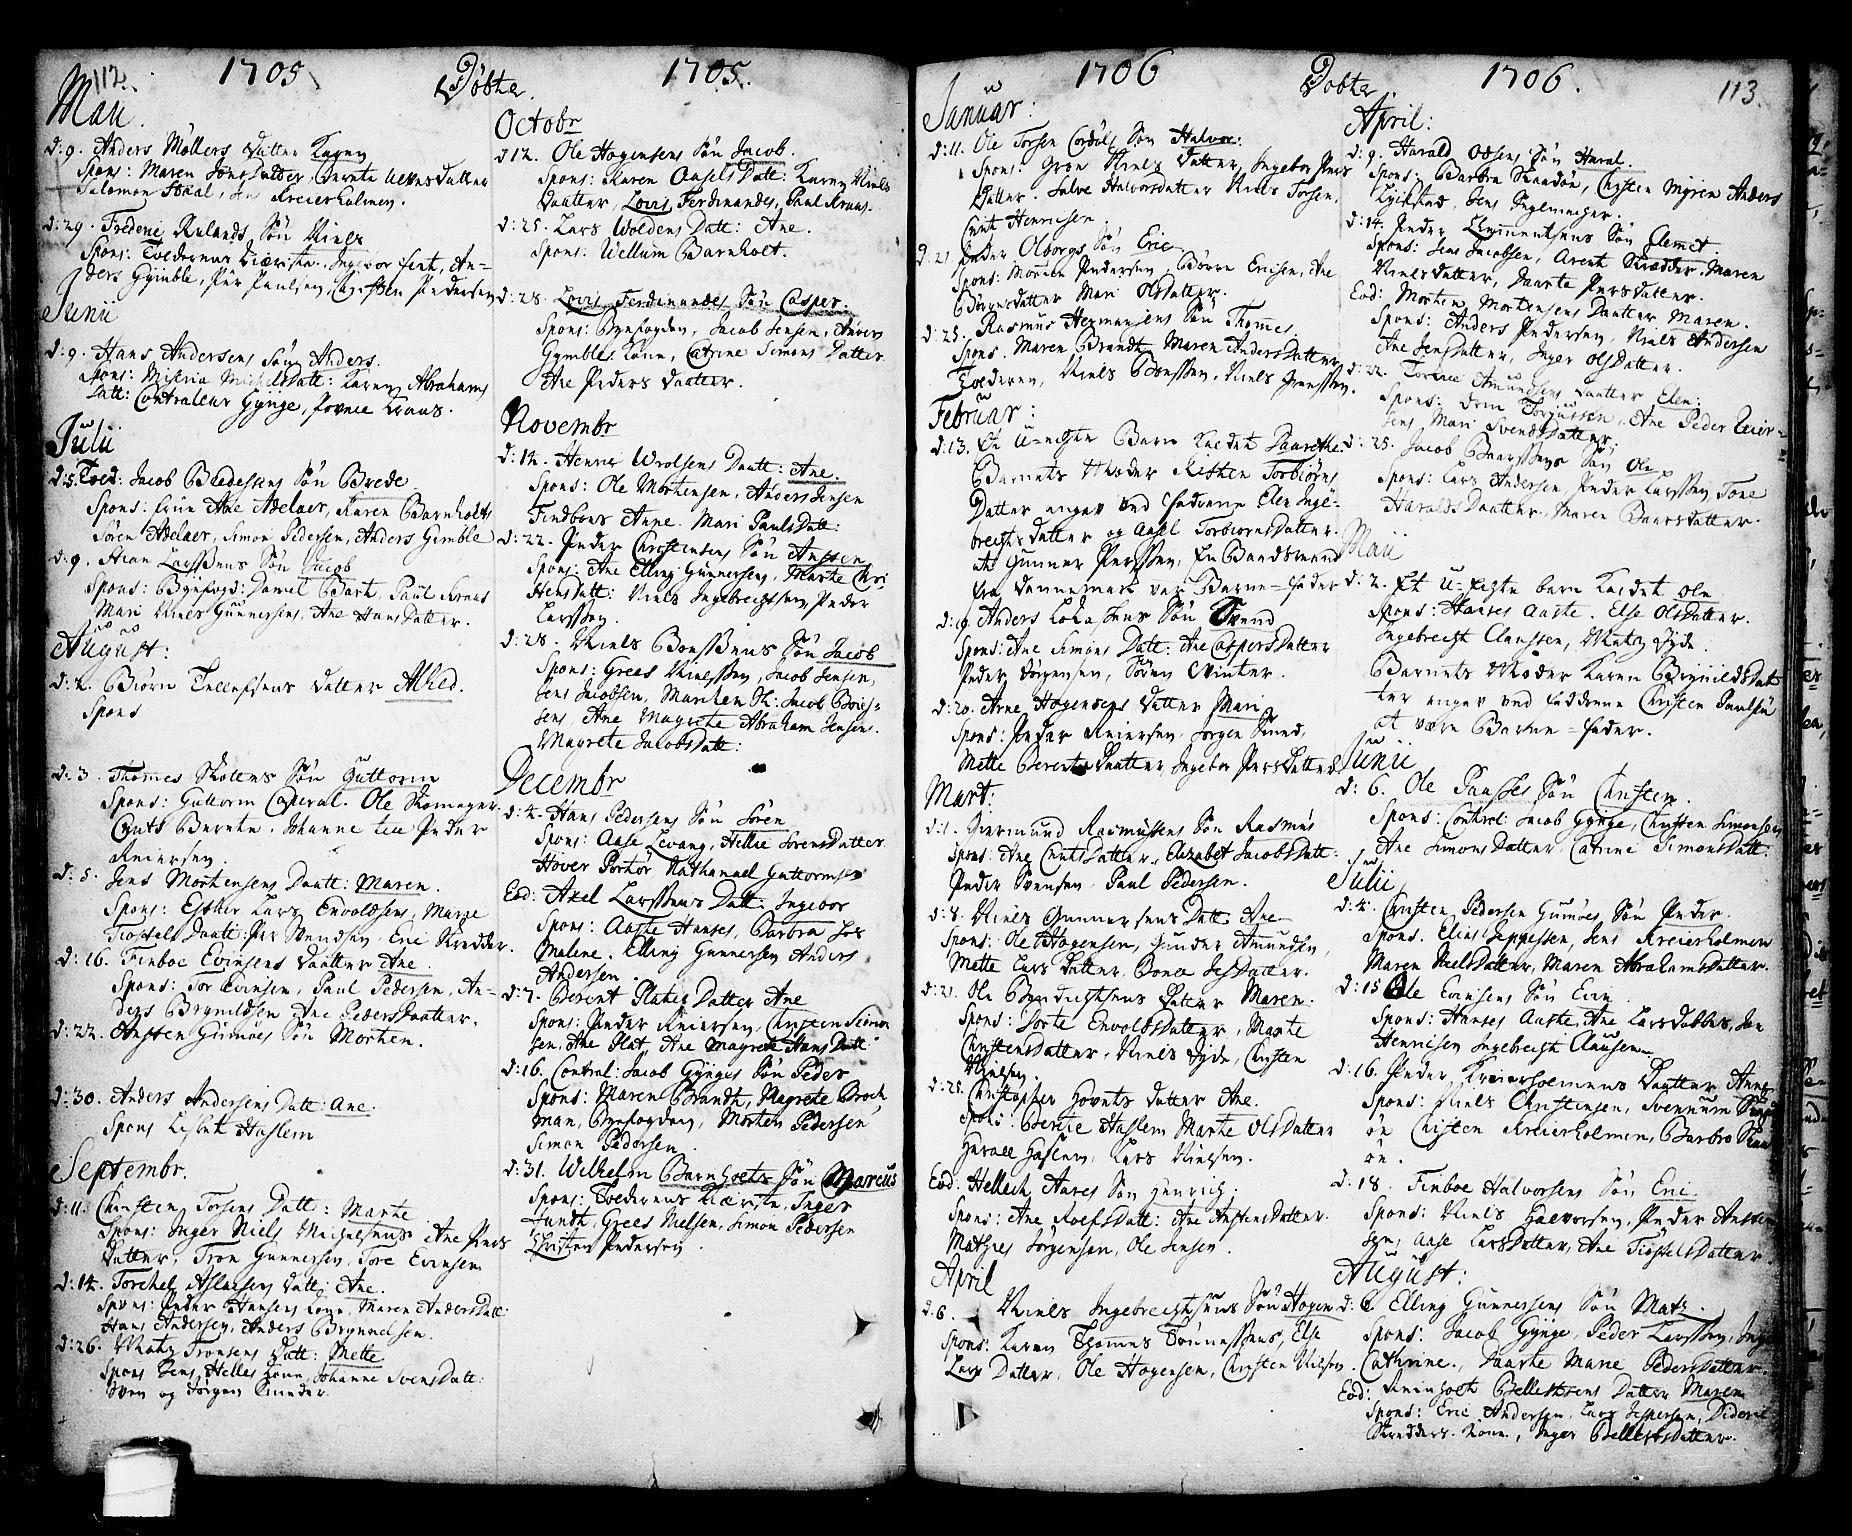 SAKO, Kragerø kirkebøker, F/Fa/L0001: Ministerialbok nr. 1, 1702-1766, s. 112-113